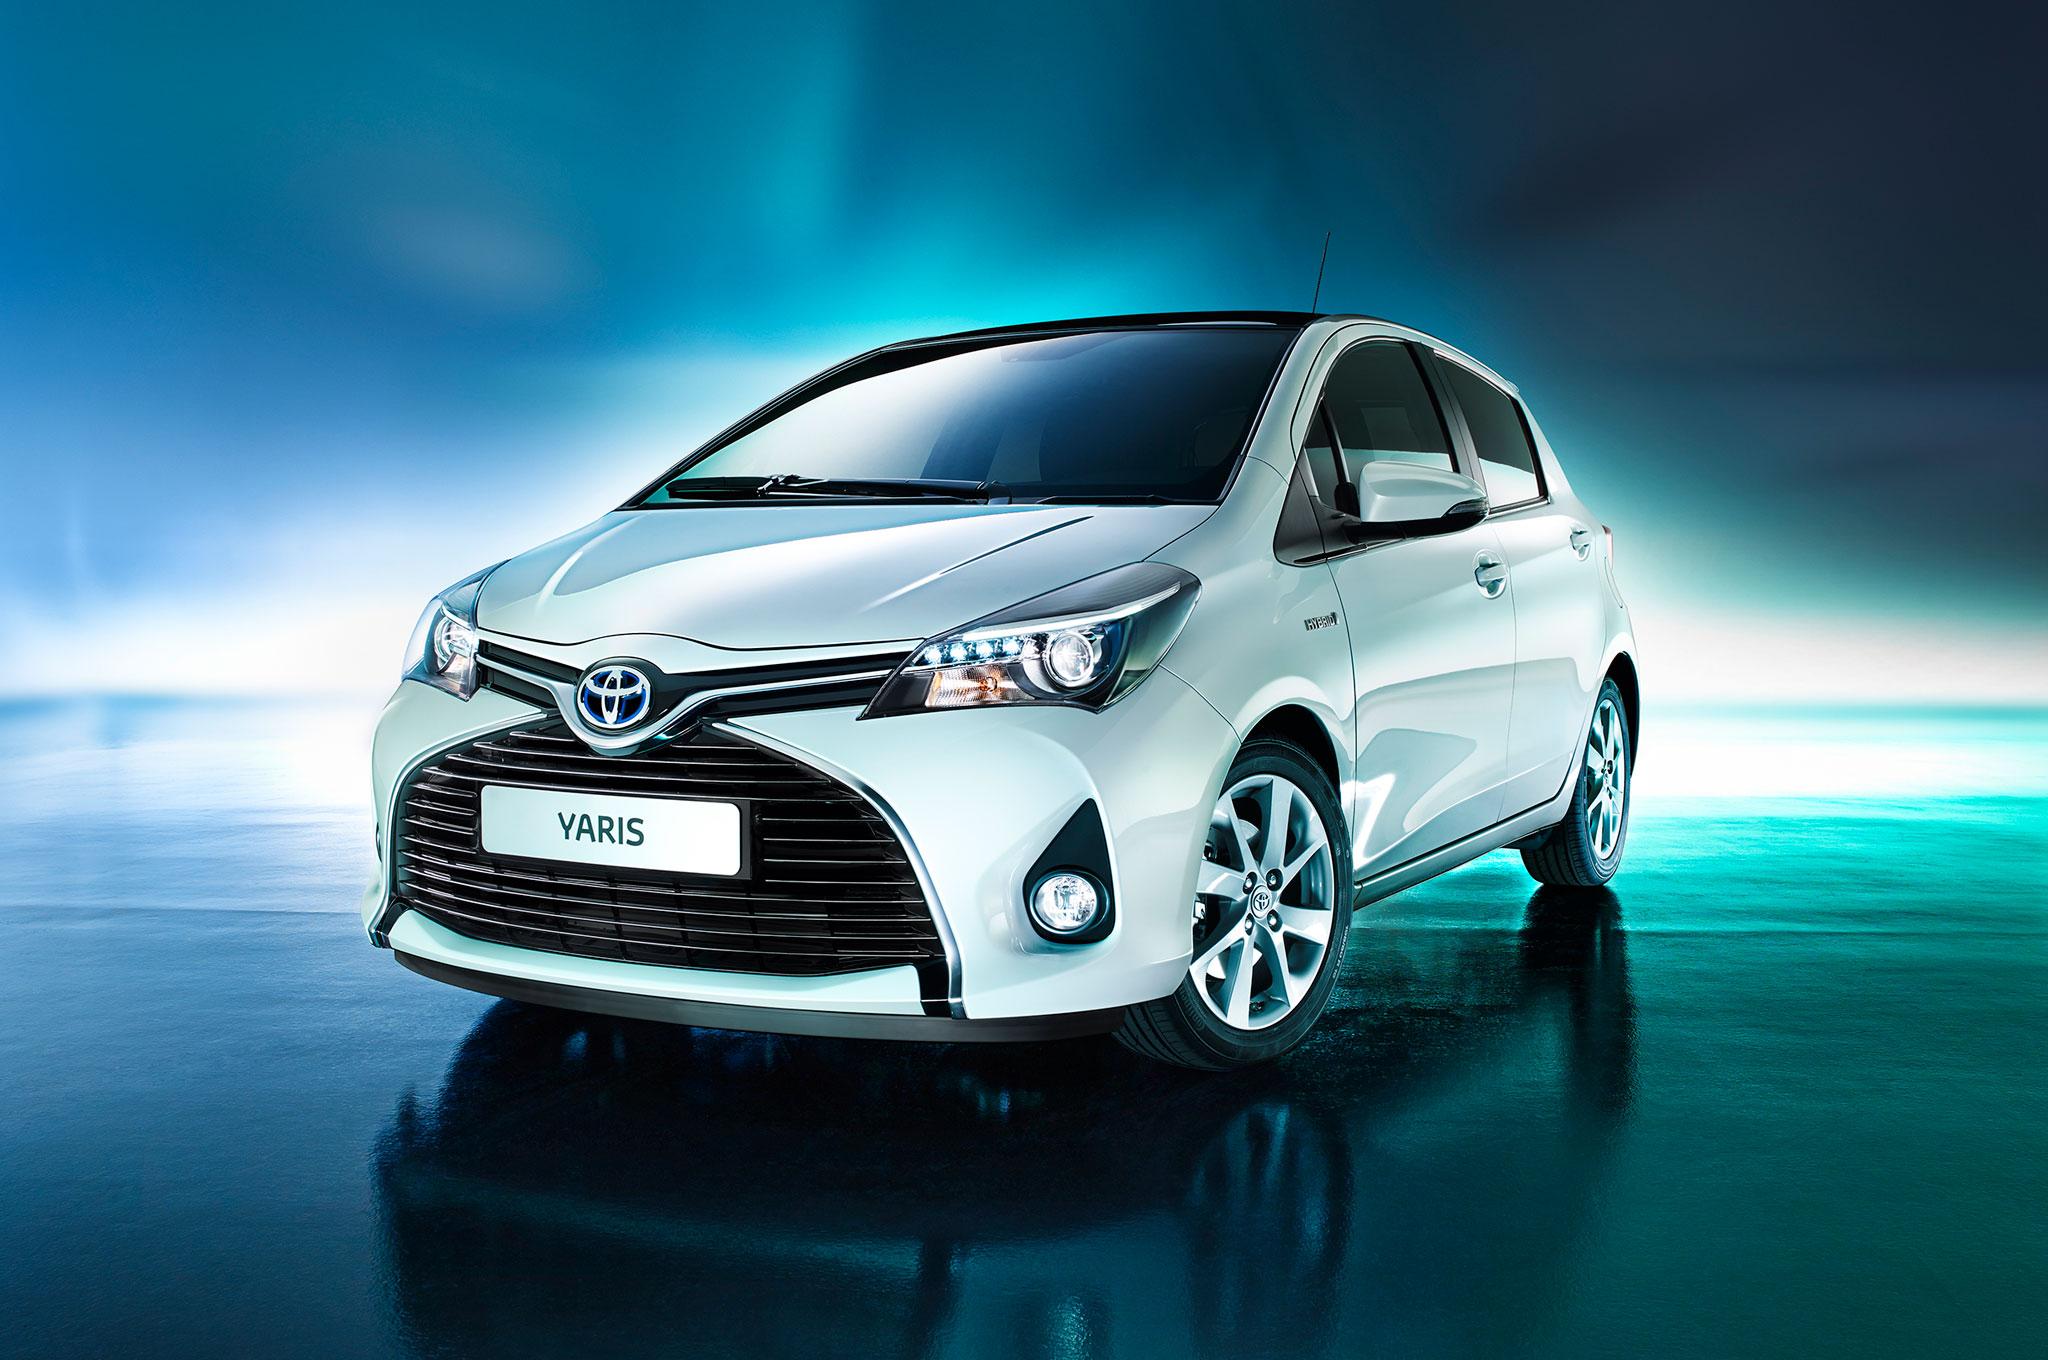 2017 Toyota Corolla Le >> 2015 Toyota Yaris Review